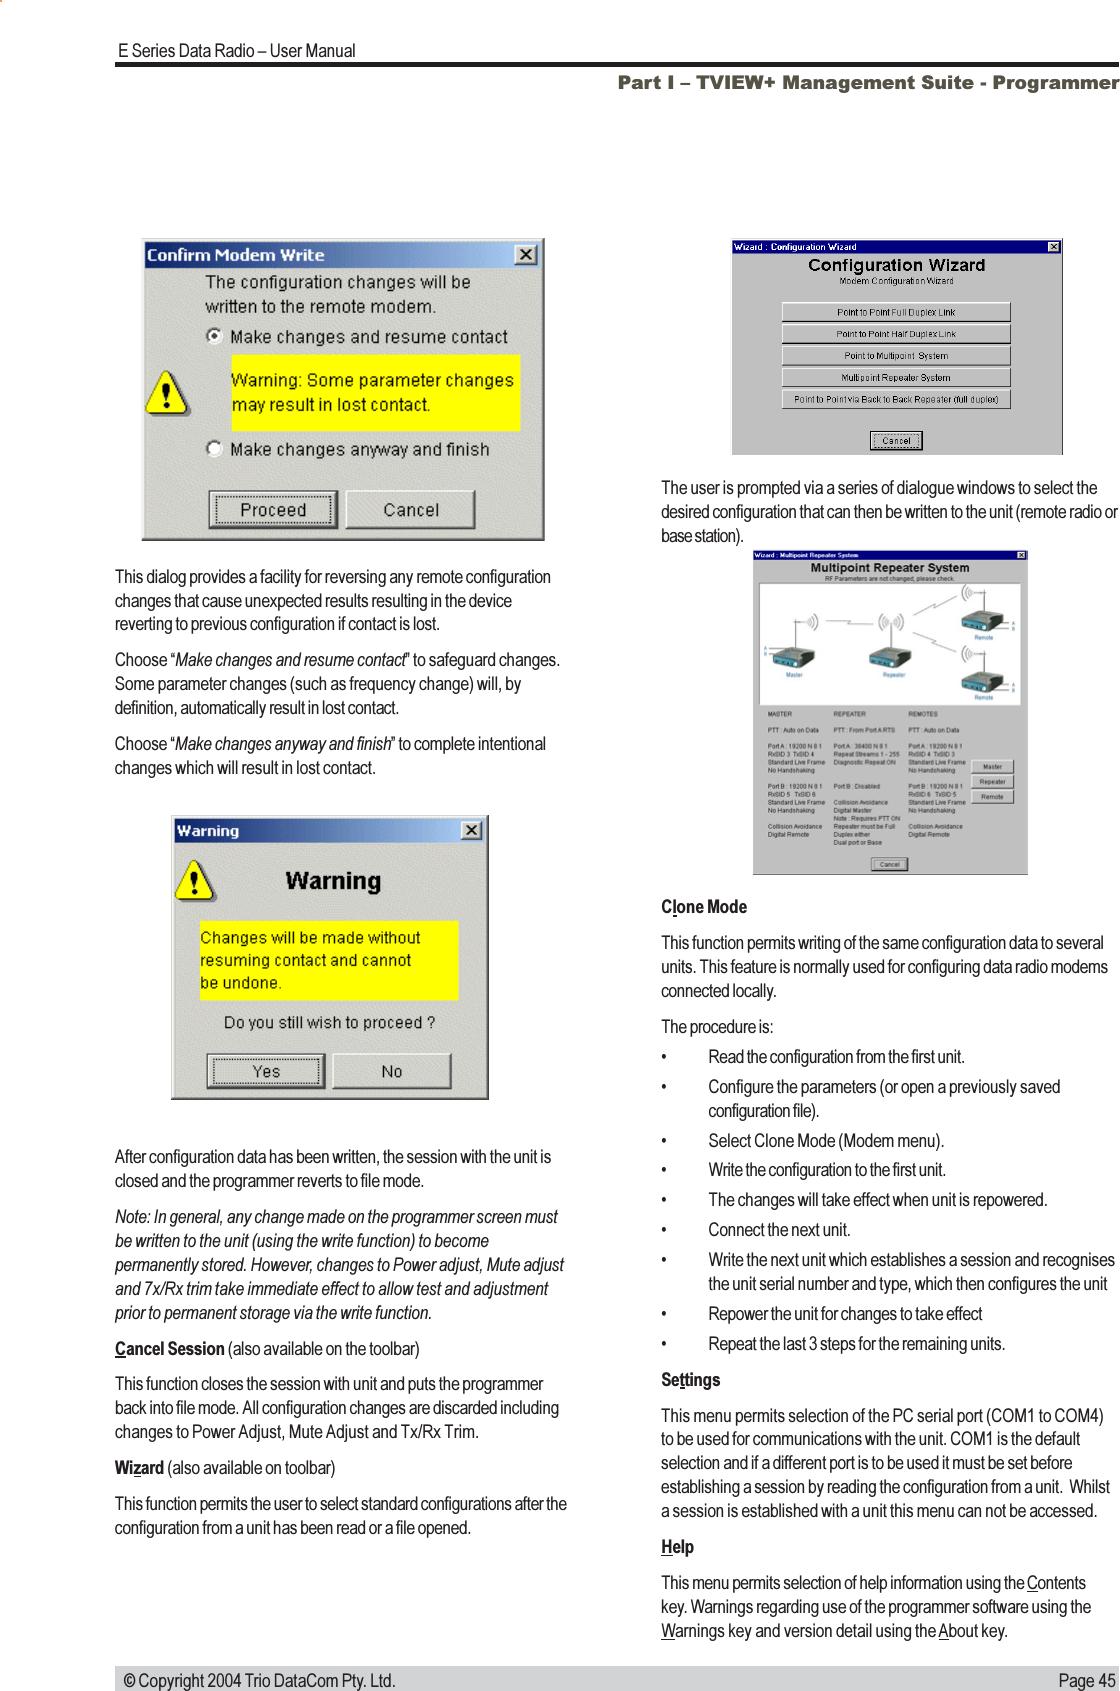 Wj Stereo Help 2004 Overland Manual Guide